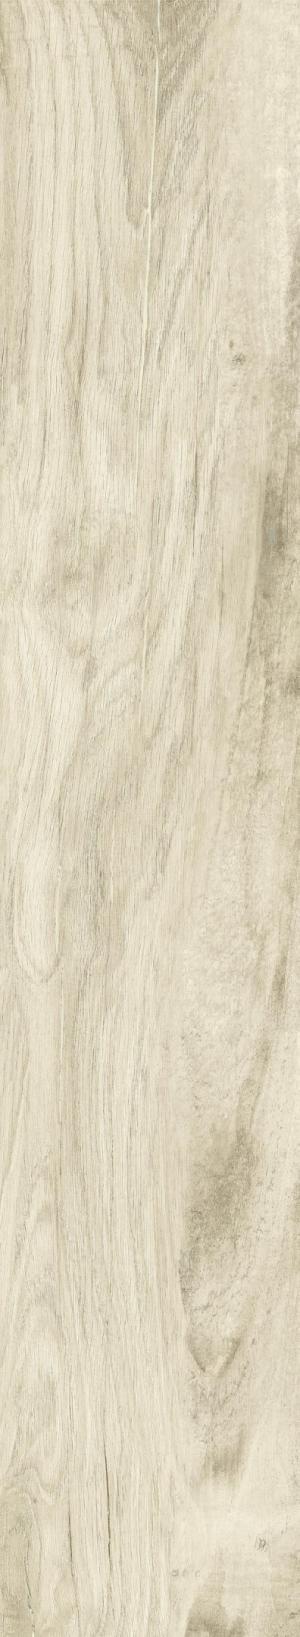 Woodland Almond